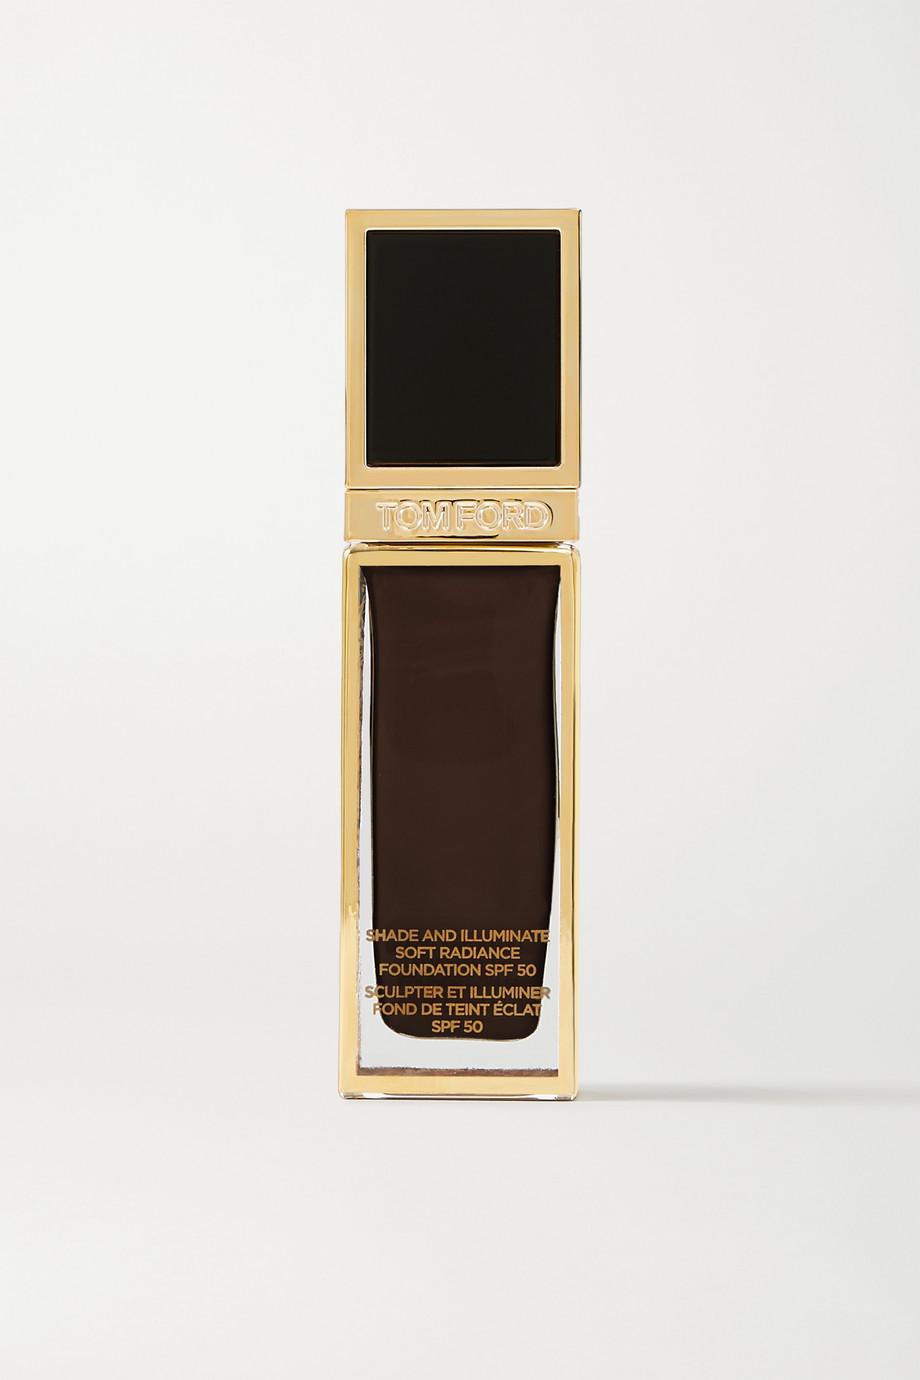 TOM FORD BEAUTY Shade and Illuminate Soft Radiance Foundation SPF50 - 13.0 Espresso, 30ml